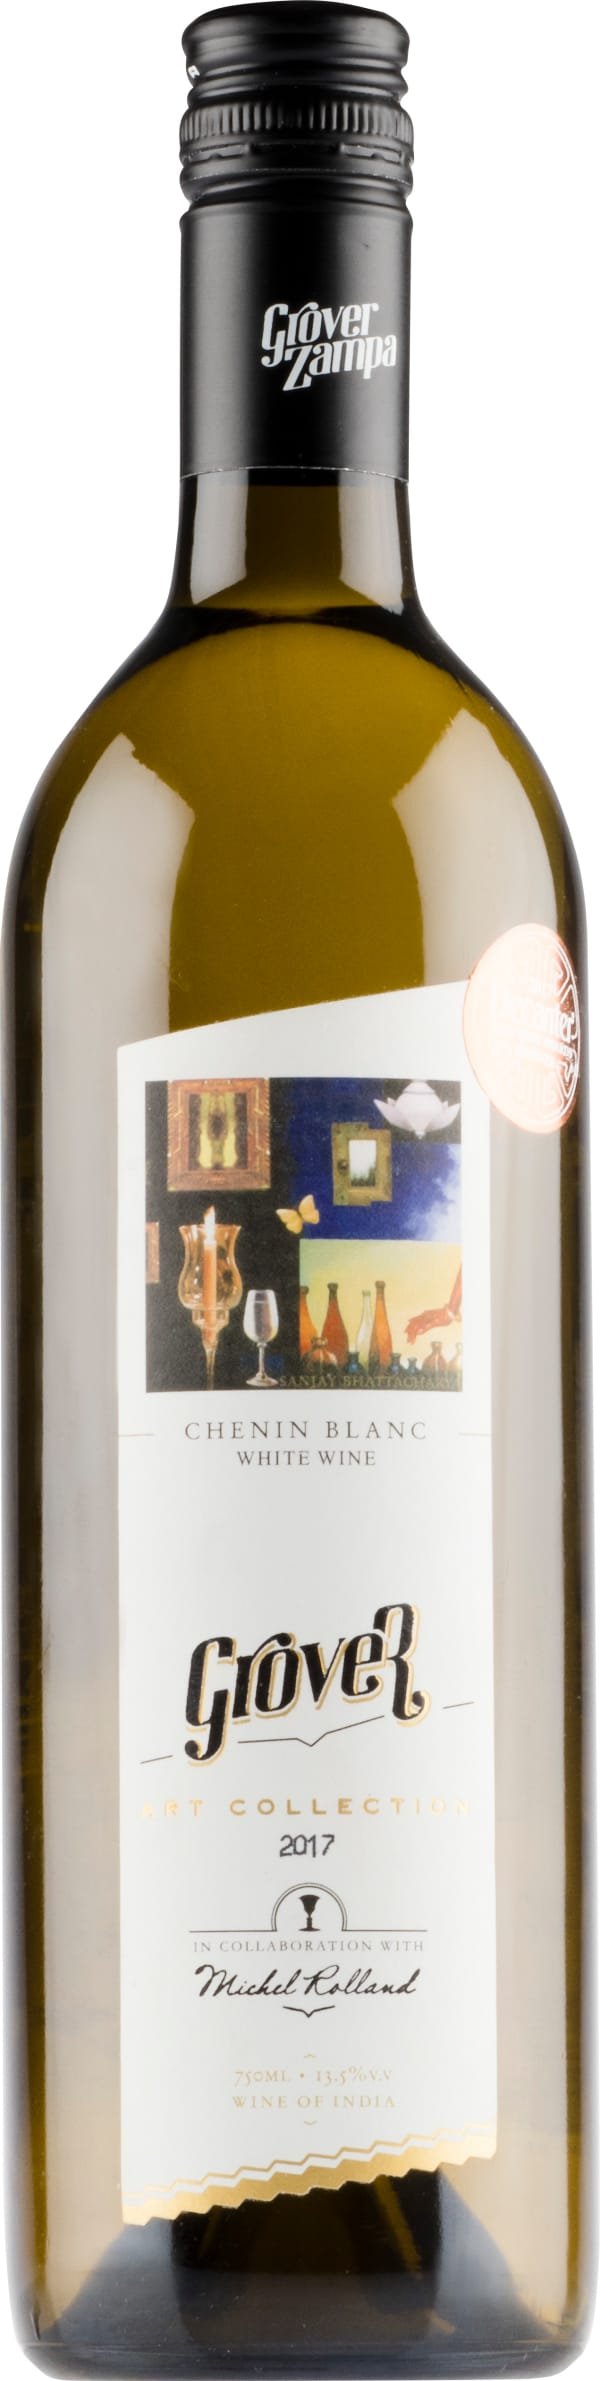 Grover Chenin Blanc 2017